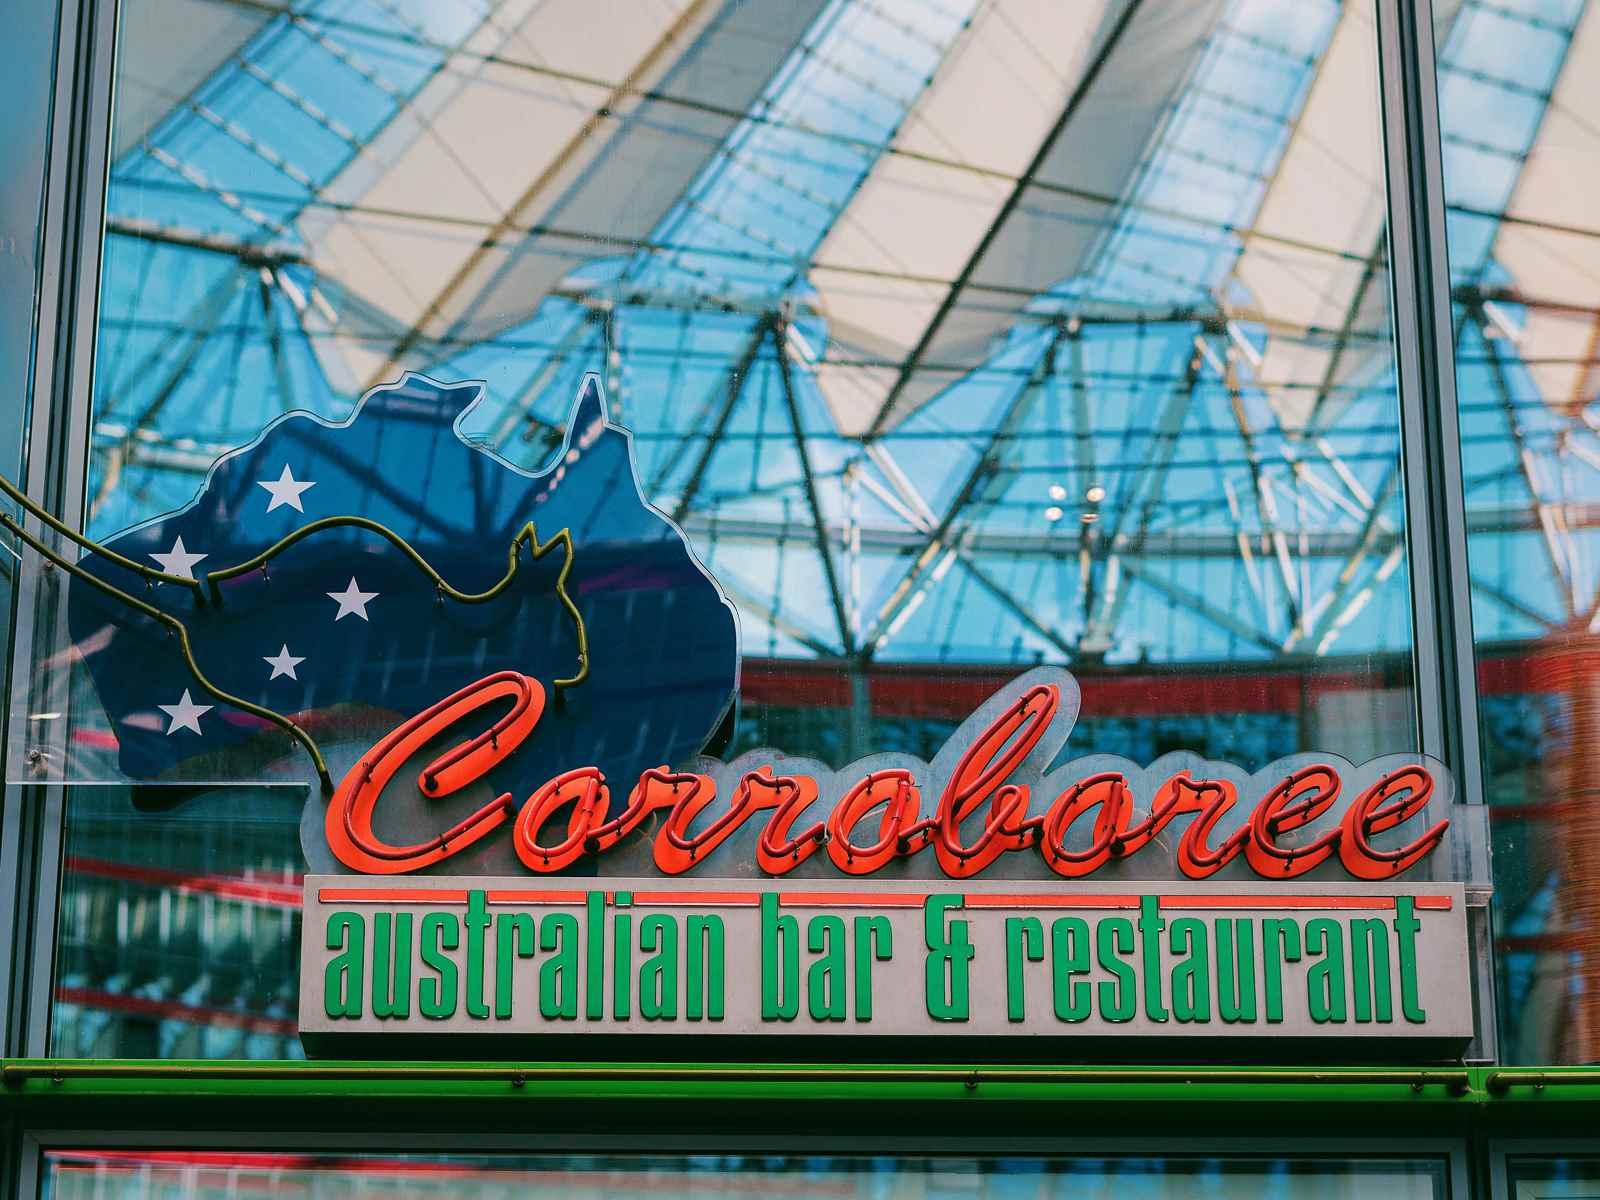 Corroboree Restaurant im Sony Center am Potsdamer Platz